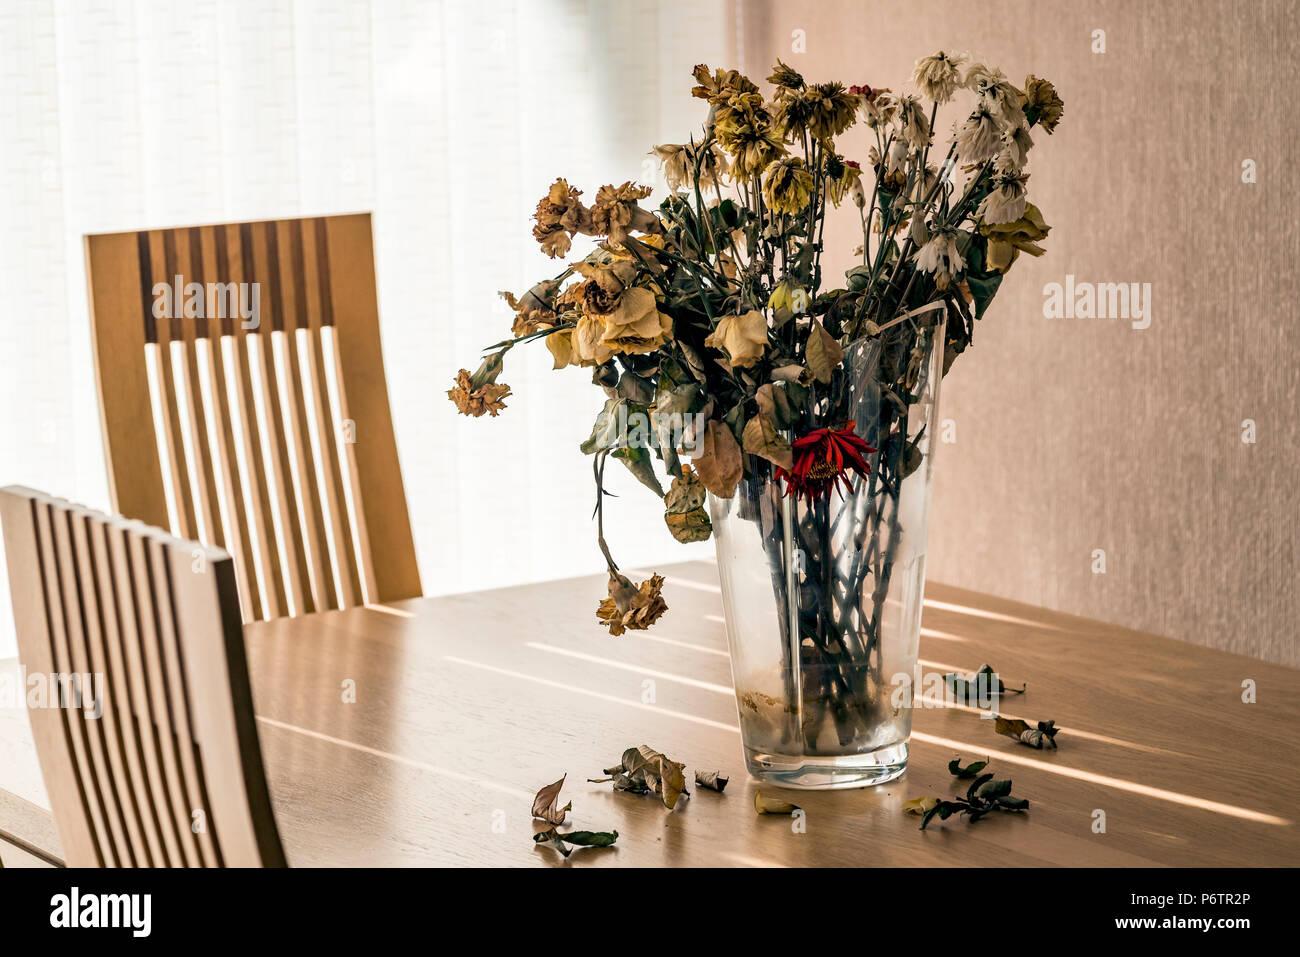 Dead Flowers Vase Stock Photos Dead Flowers Vase Stock Images Alamy